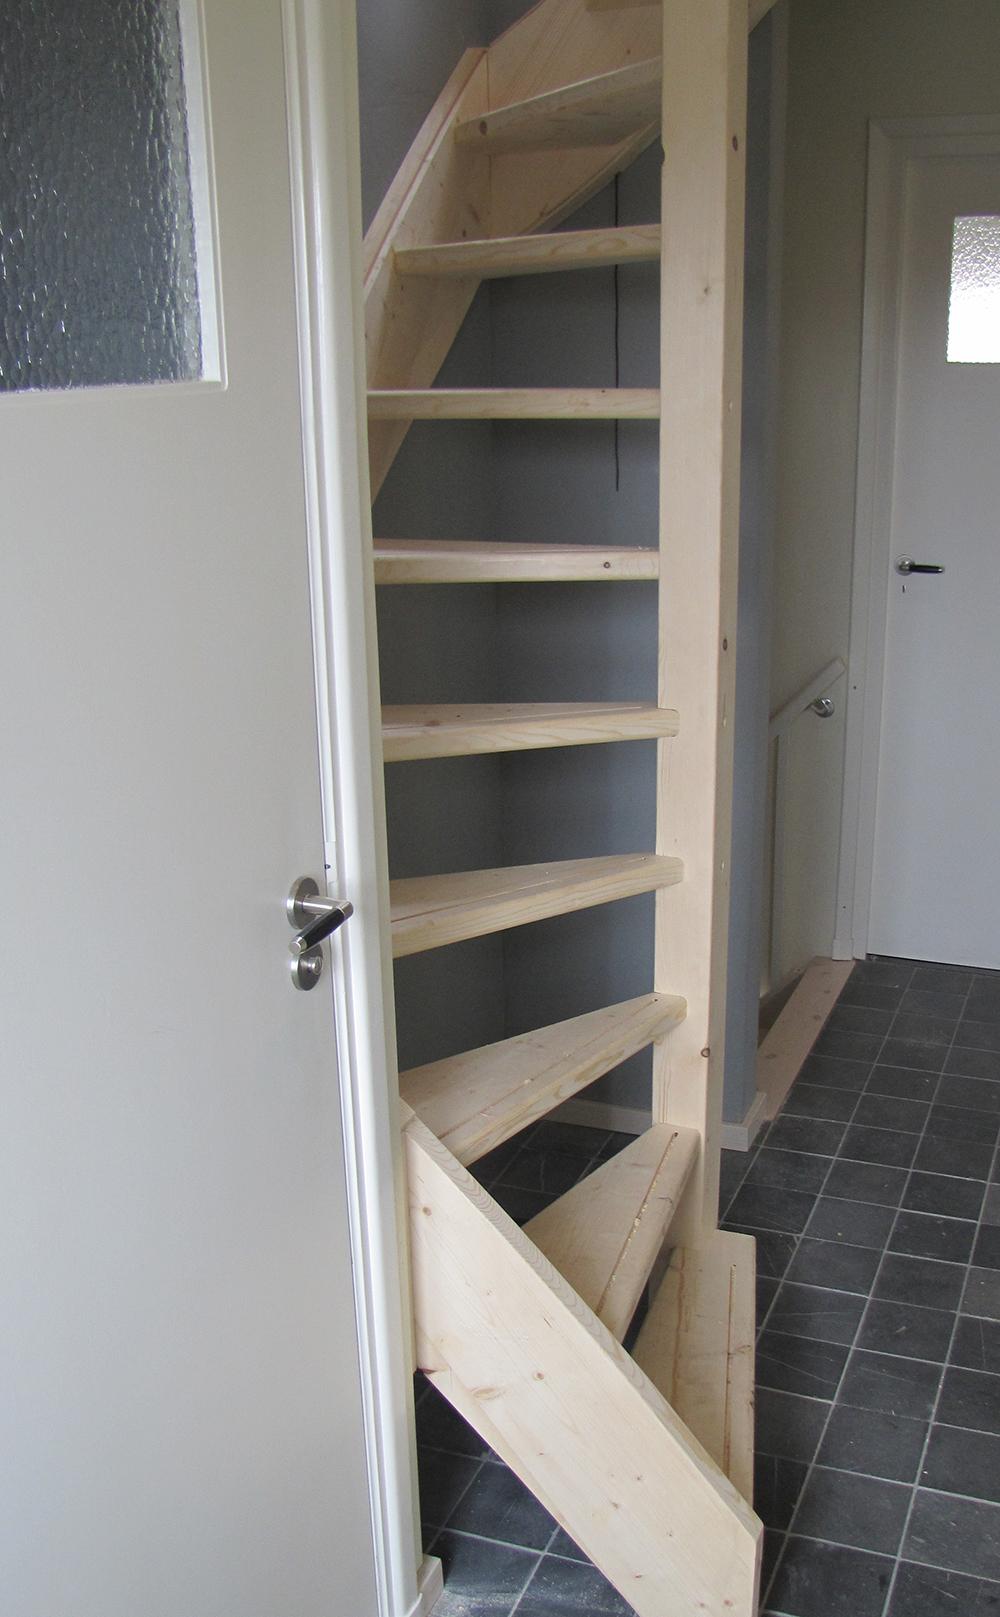 Vurenhouten trappen archieven beijes trappen bouw for Vurenhouten trap